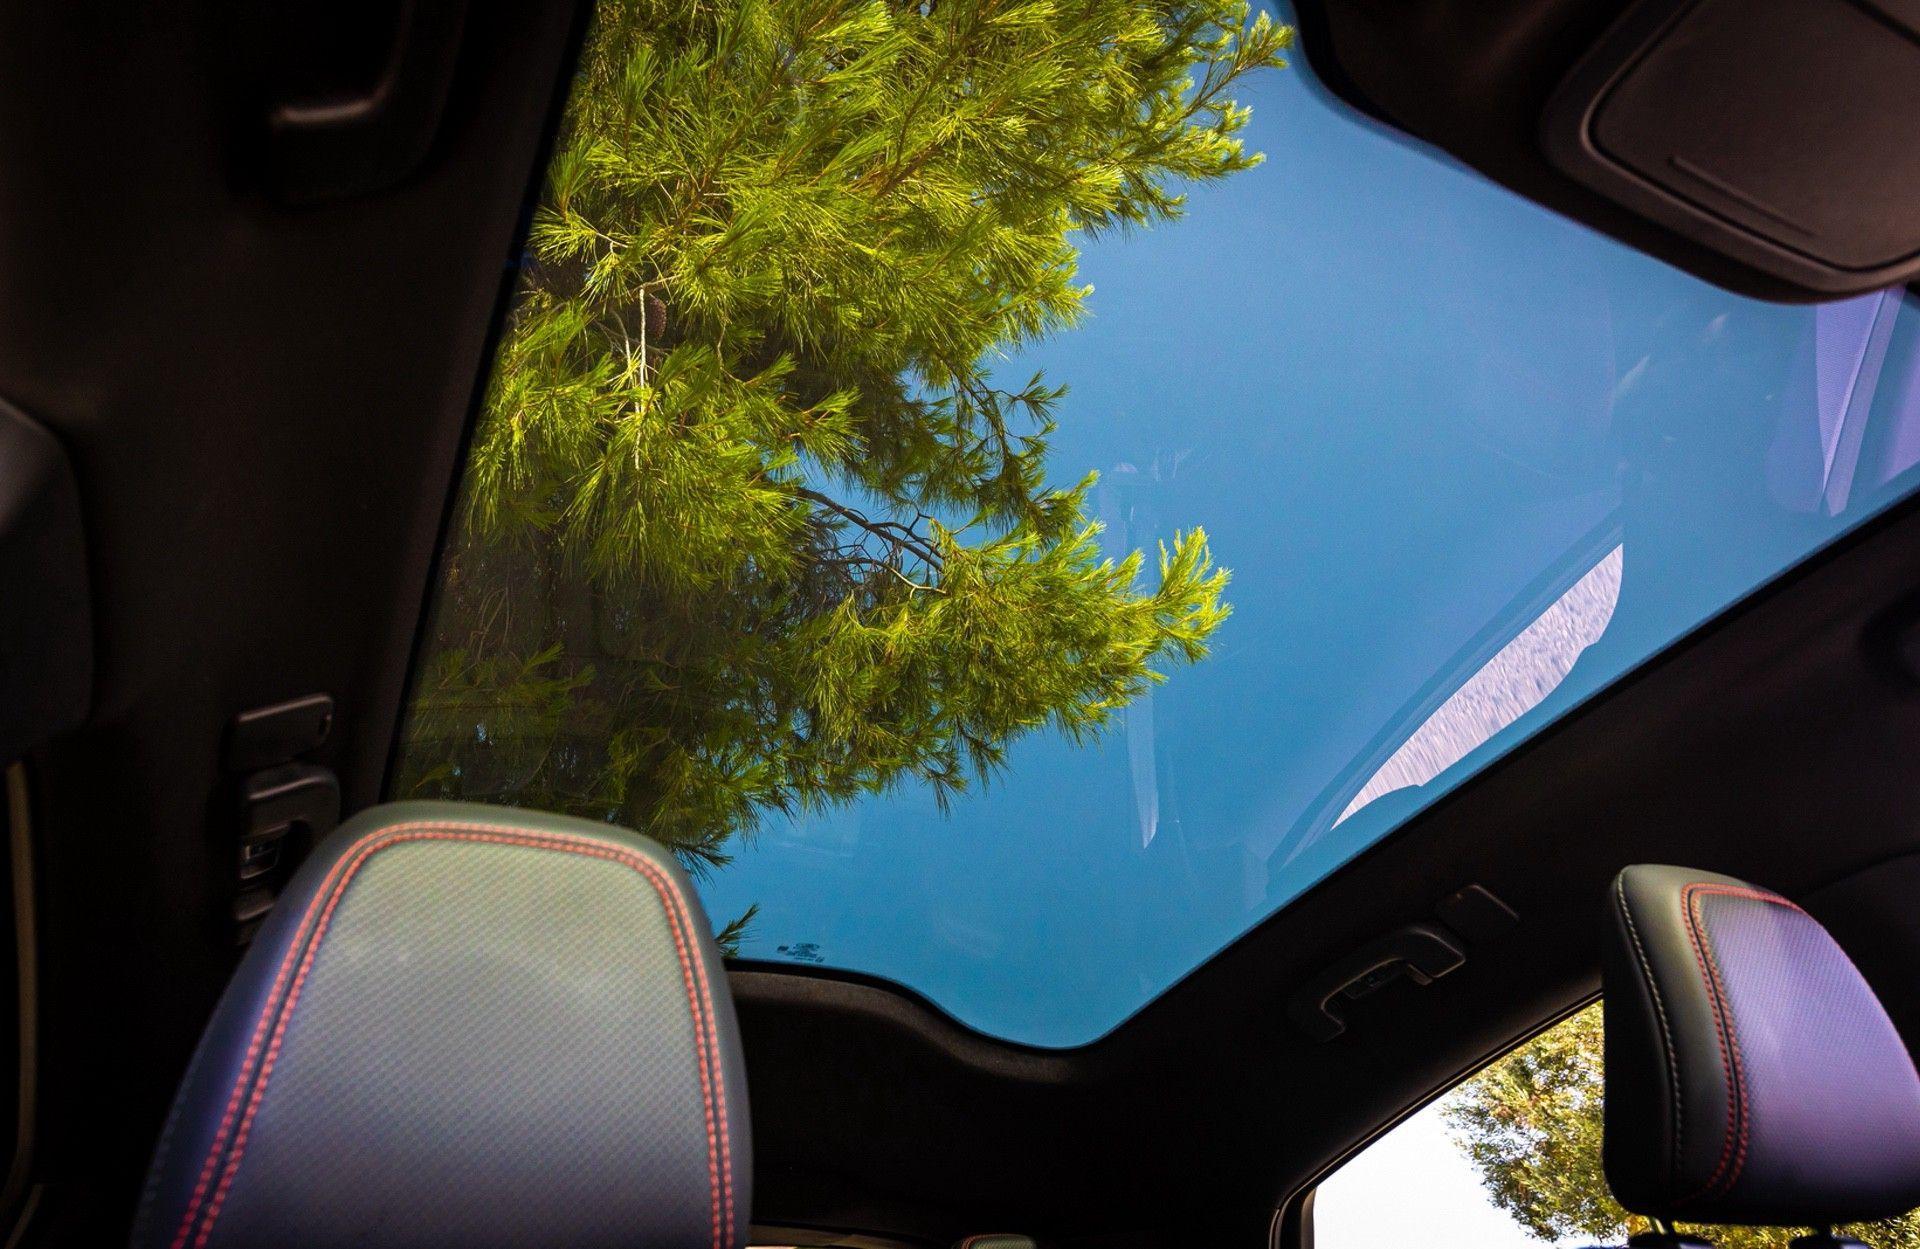 Ford_Mustang_Mach-E_greek_presskit-0174